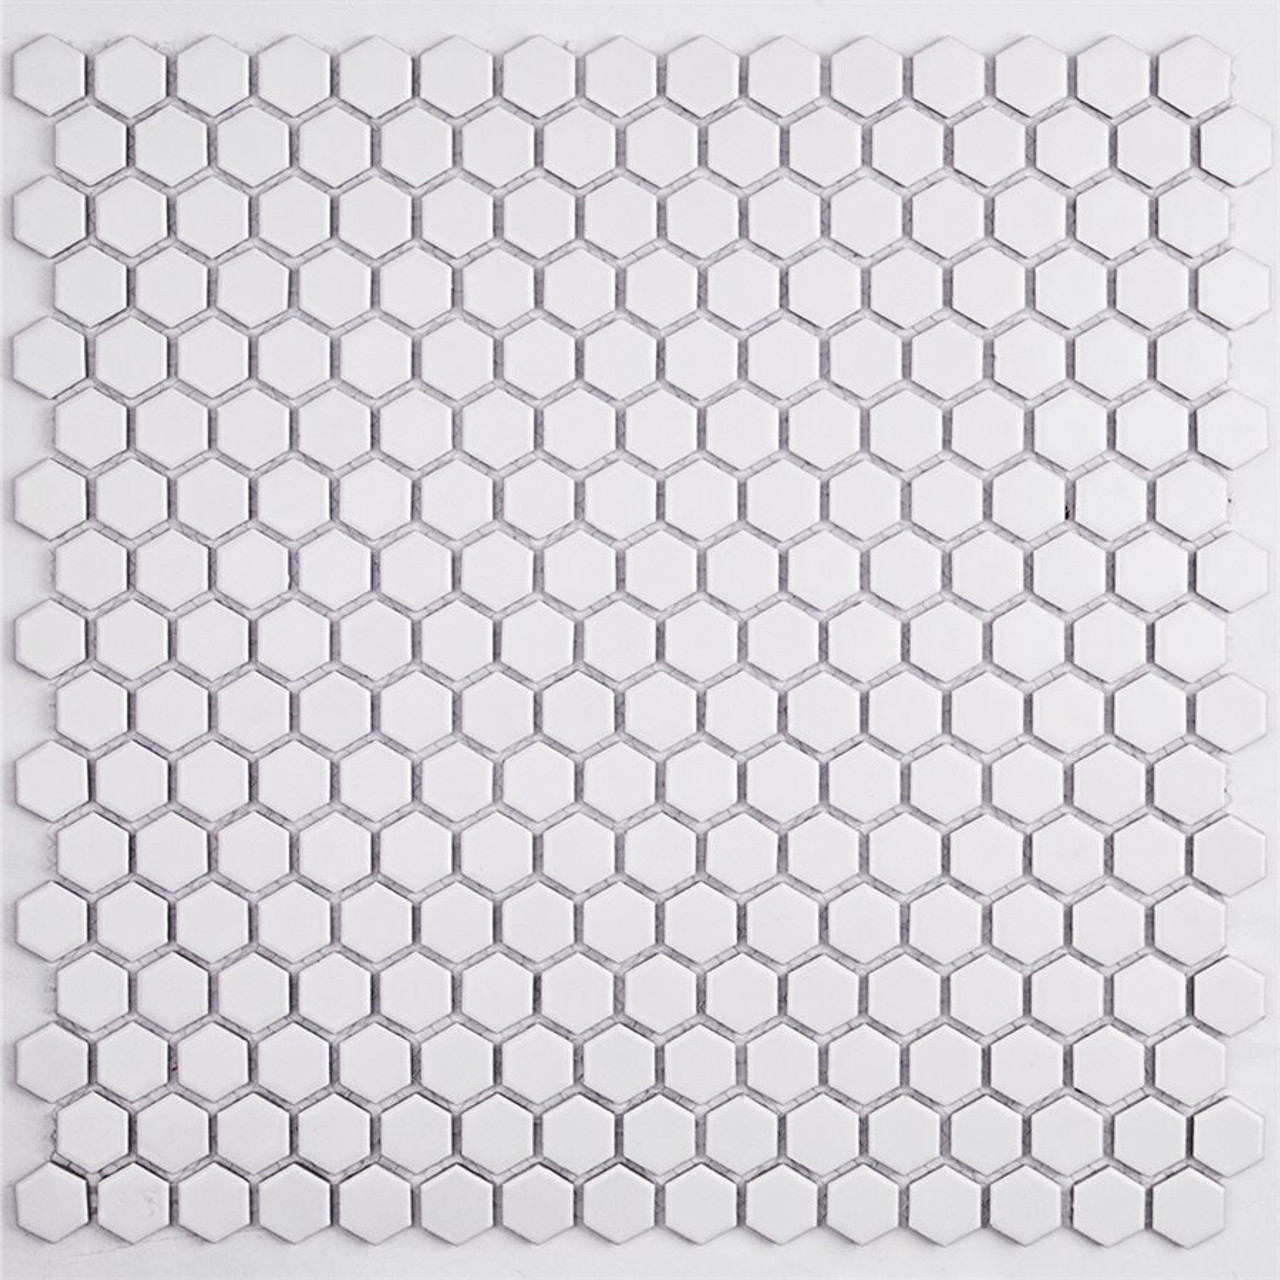 Soho Studio Simple Hexagon Solid White Matte